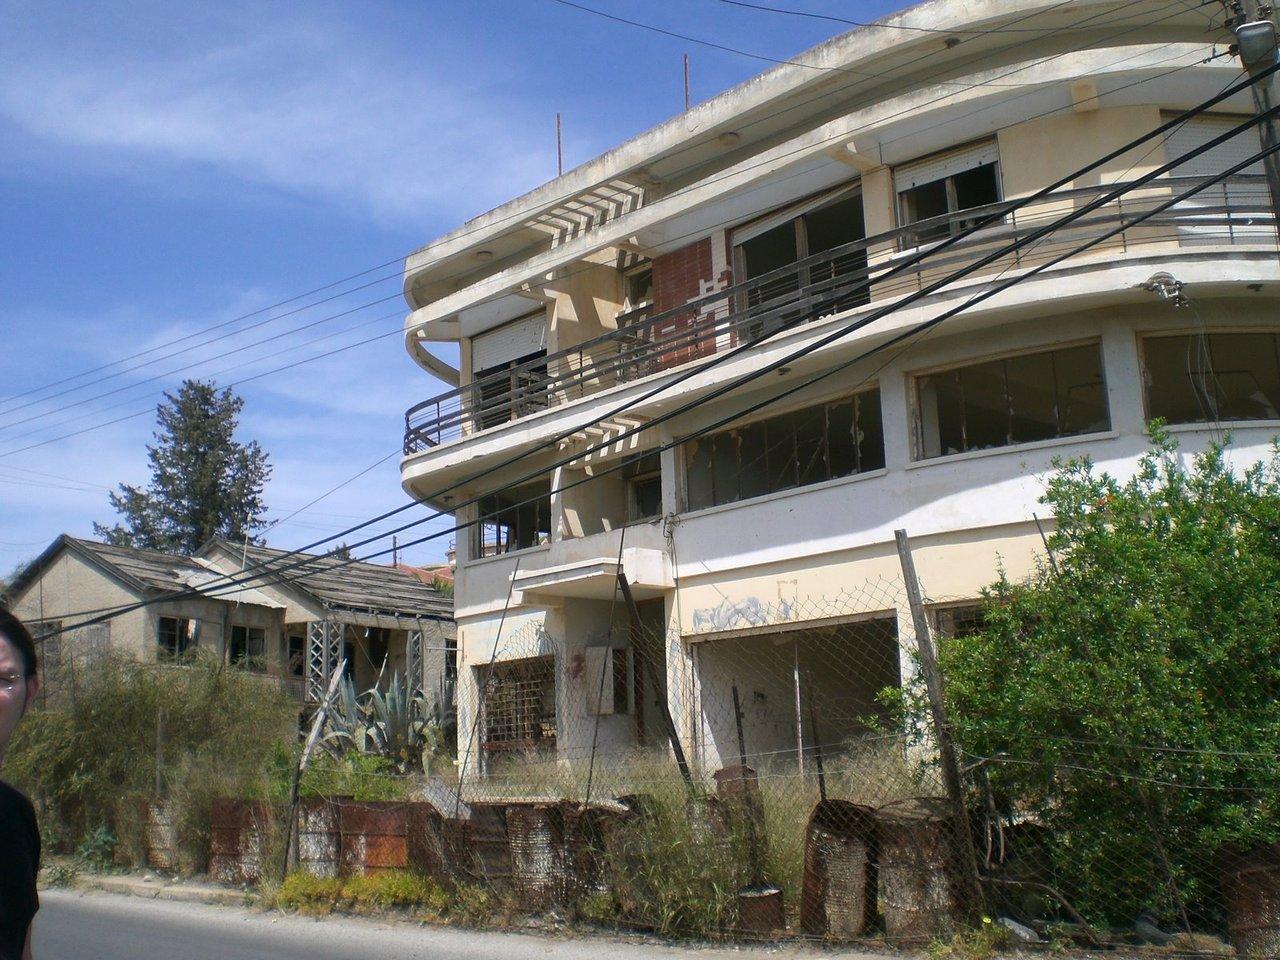 22-kapali-maras-hayalet-sehir-varosha-cyprus-